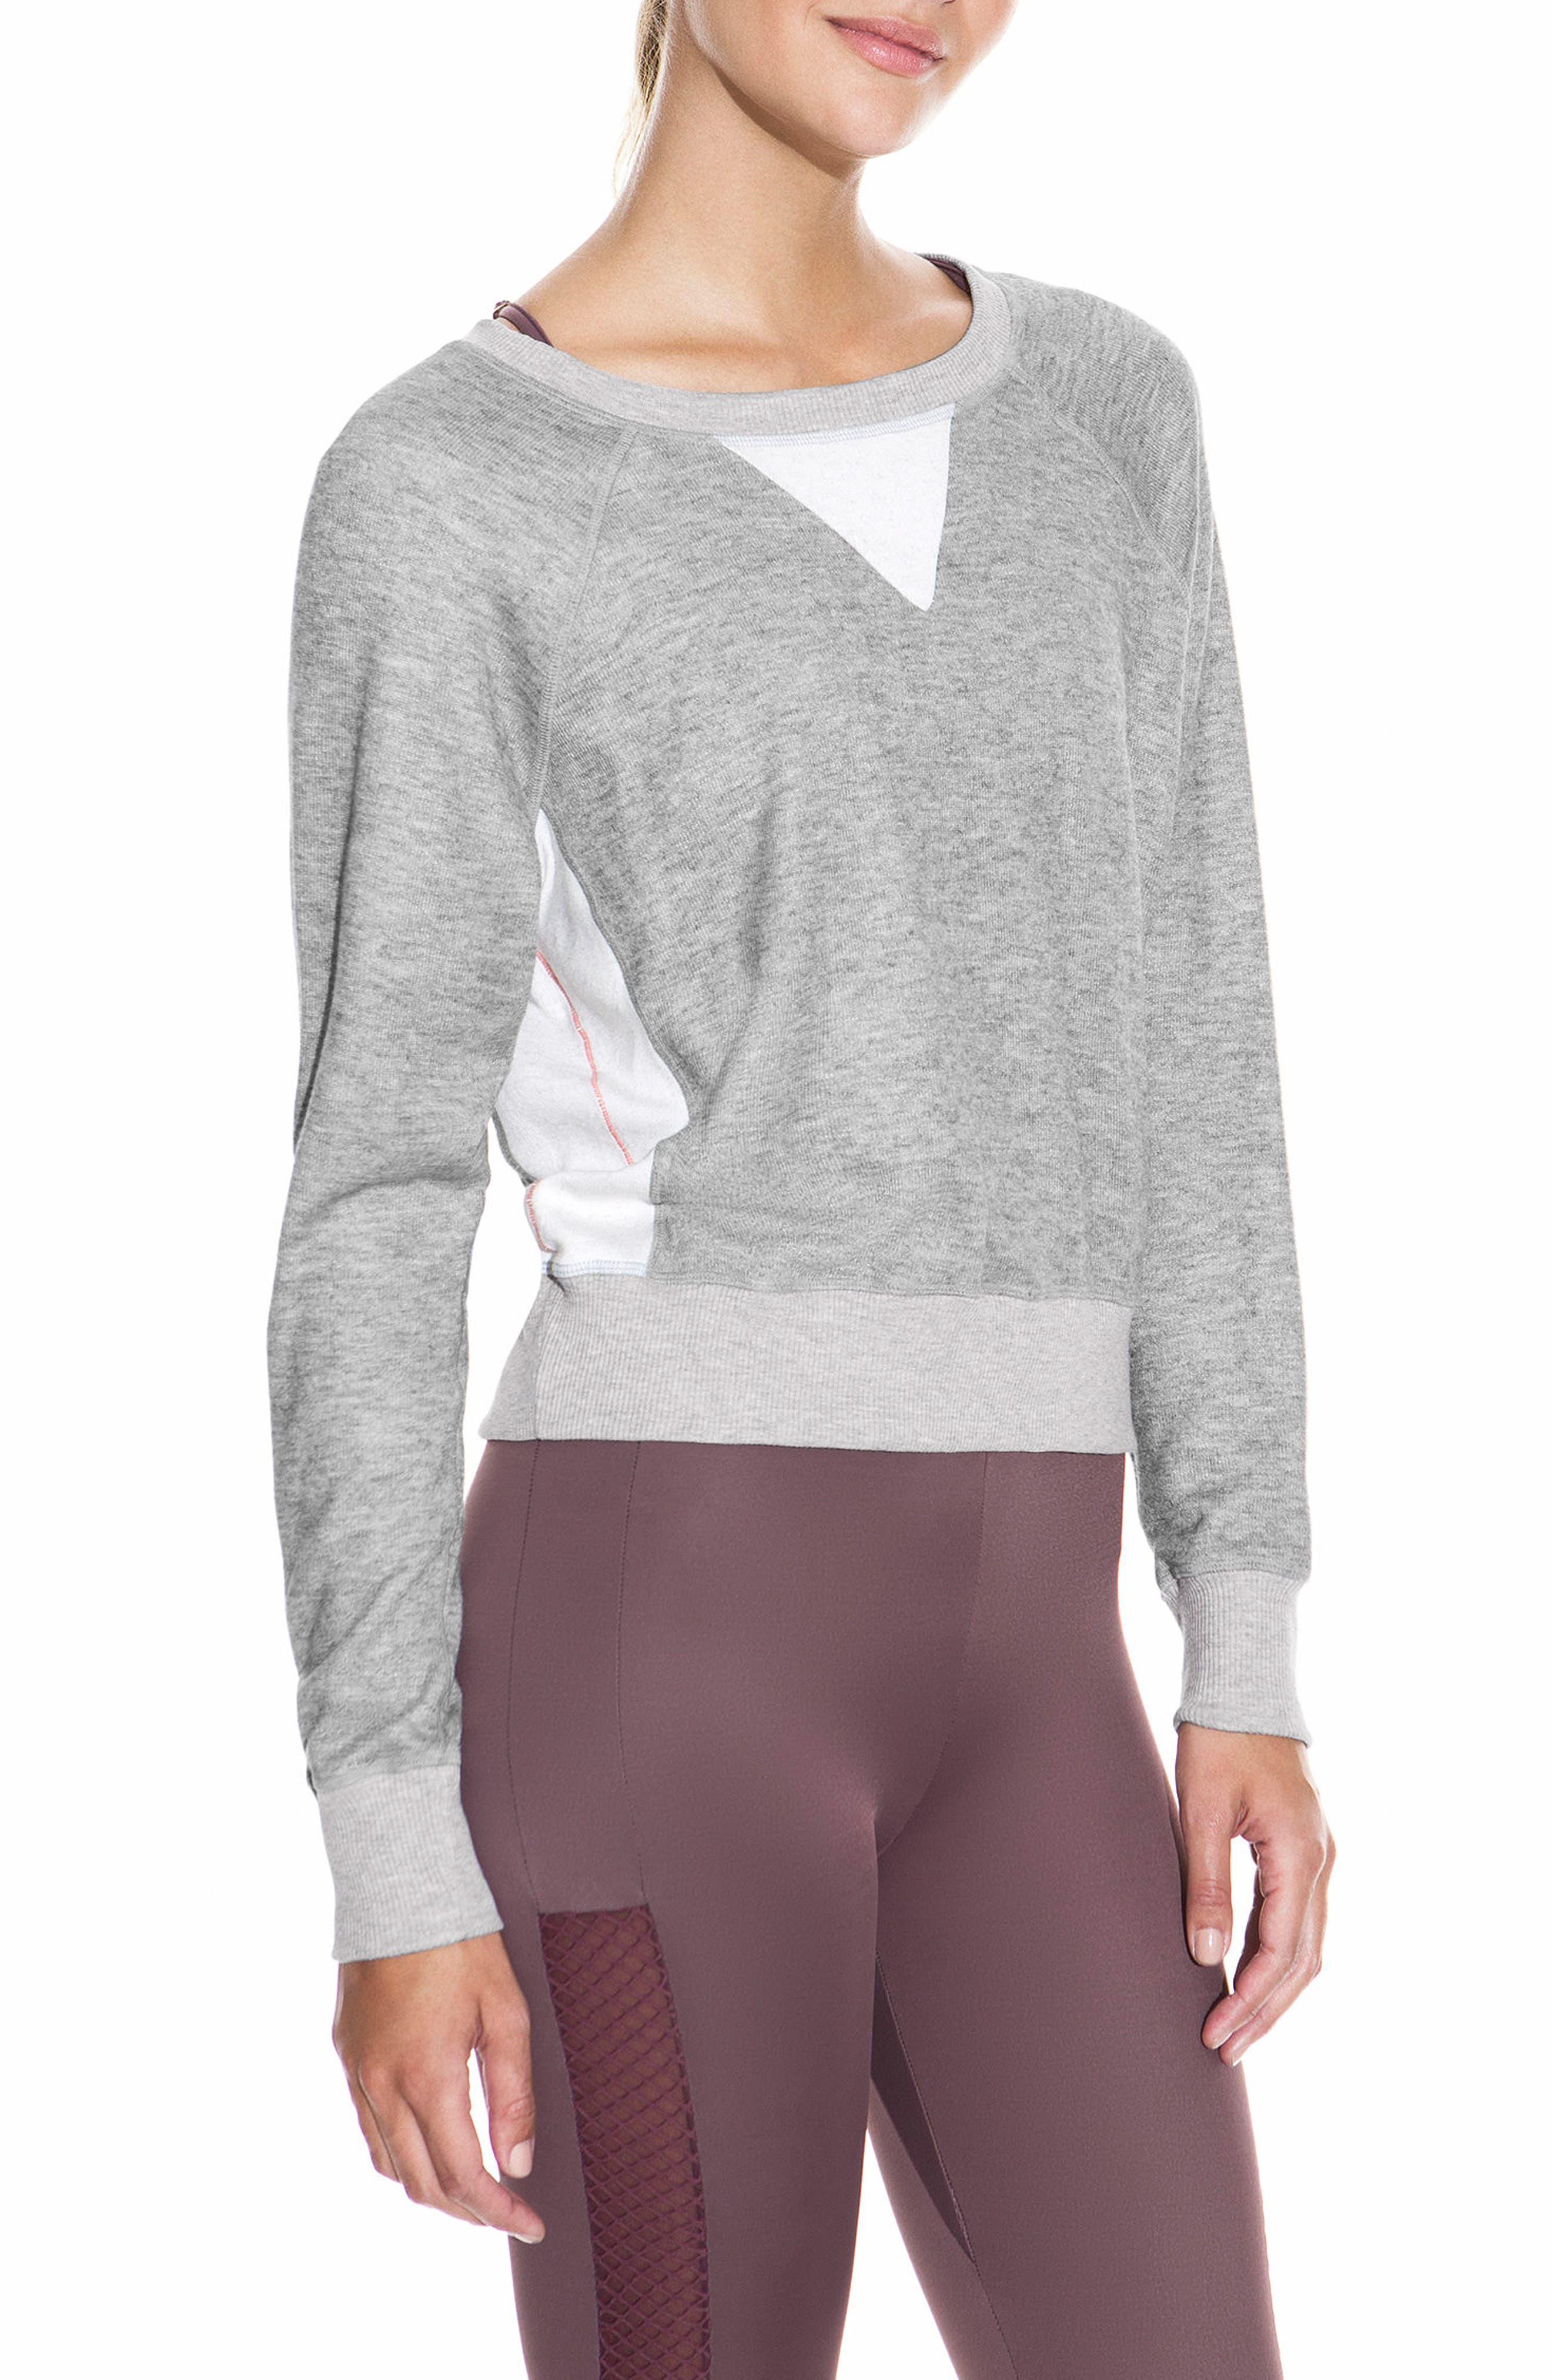 Glimmer Granite Sweatshirt,                         Main,                         color, 030